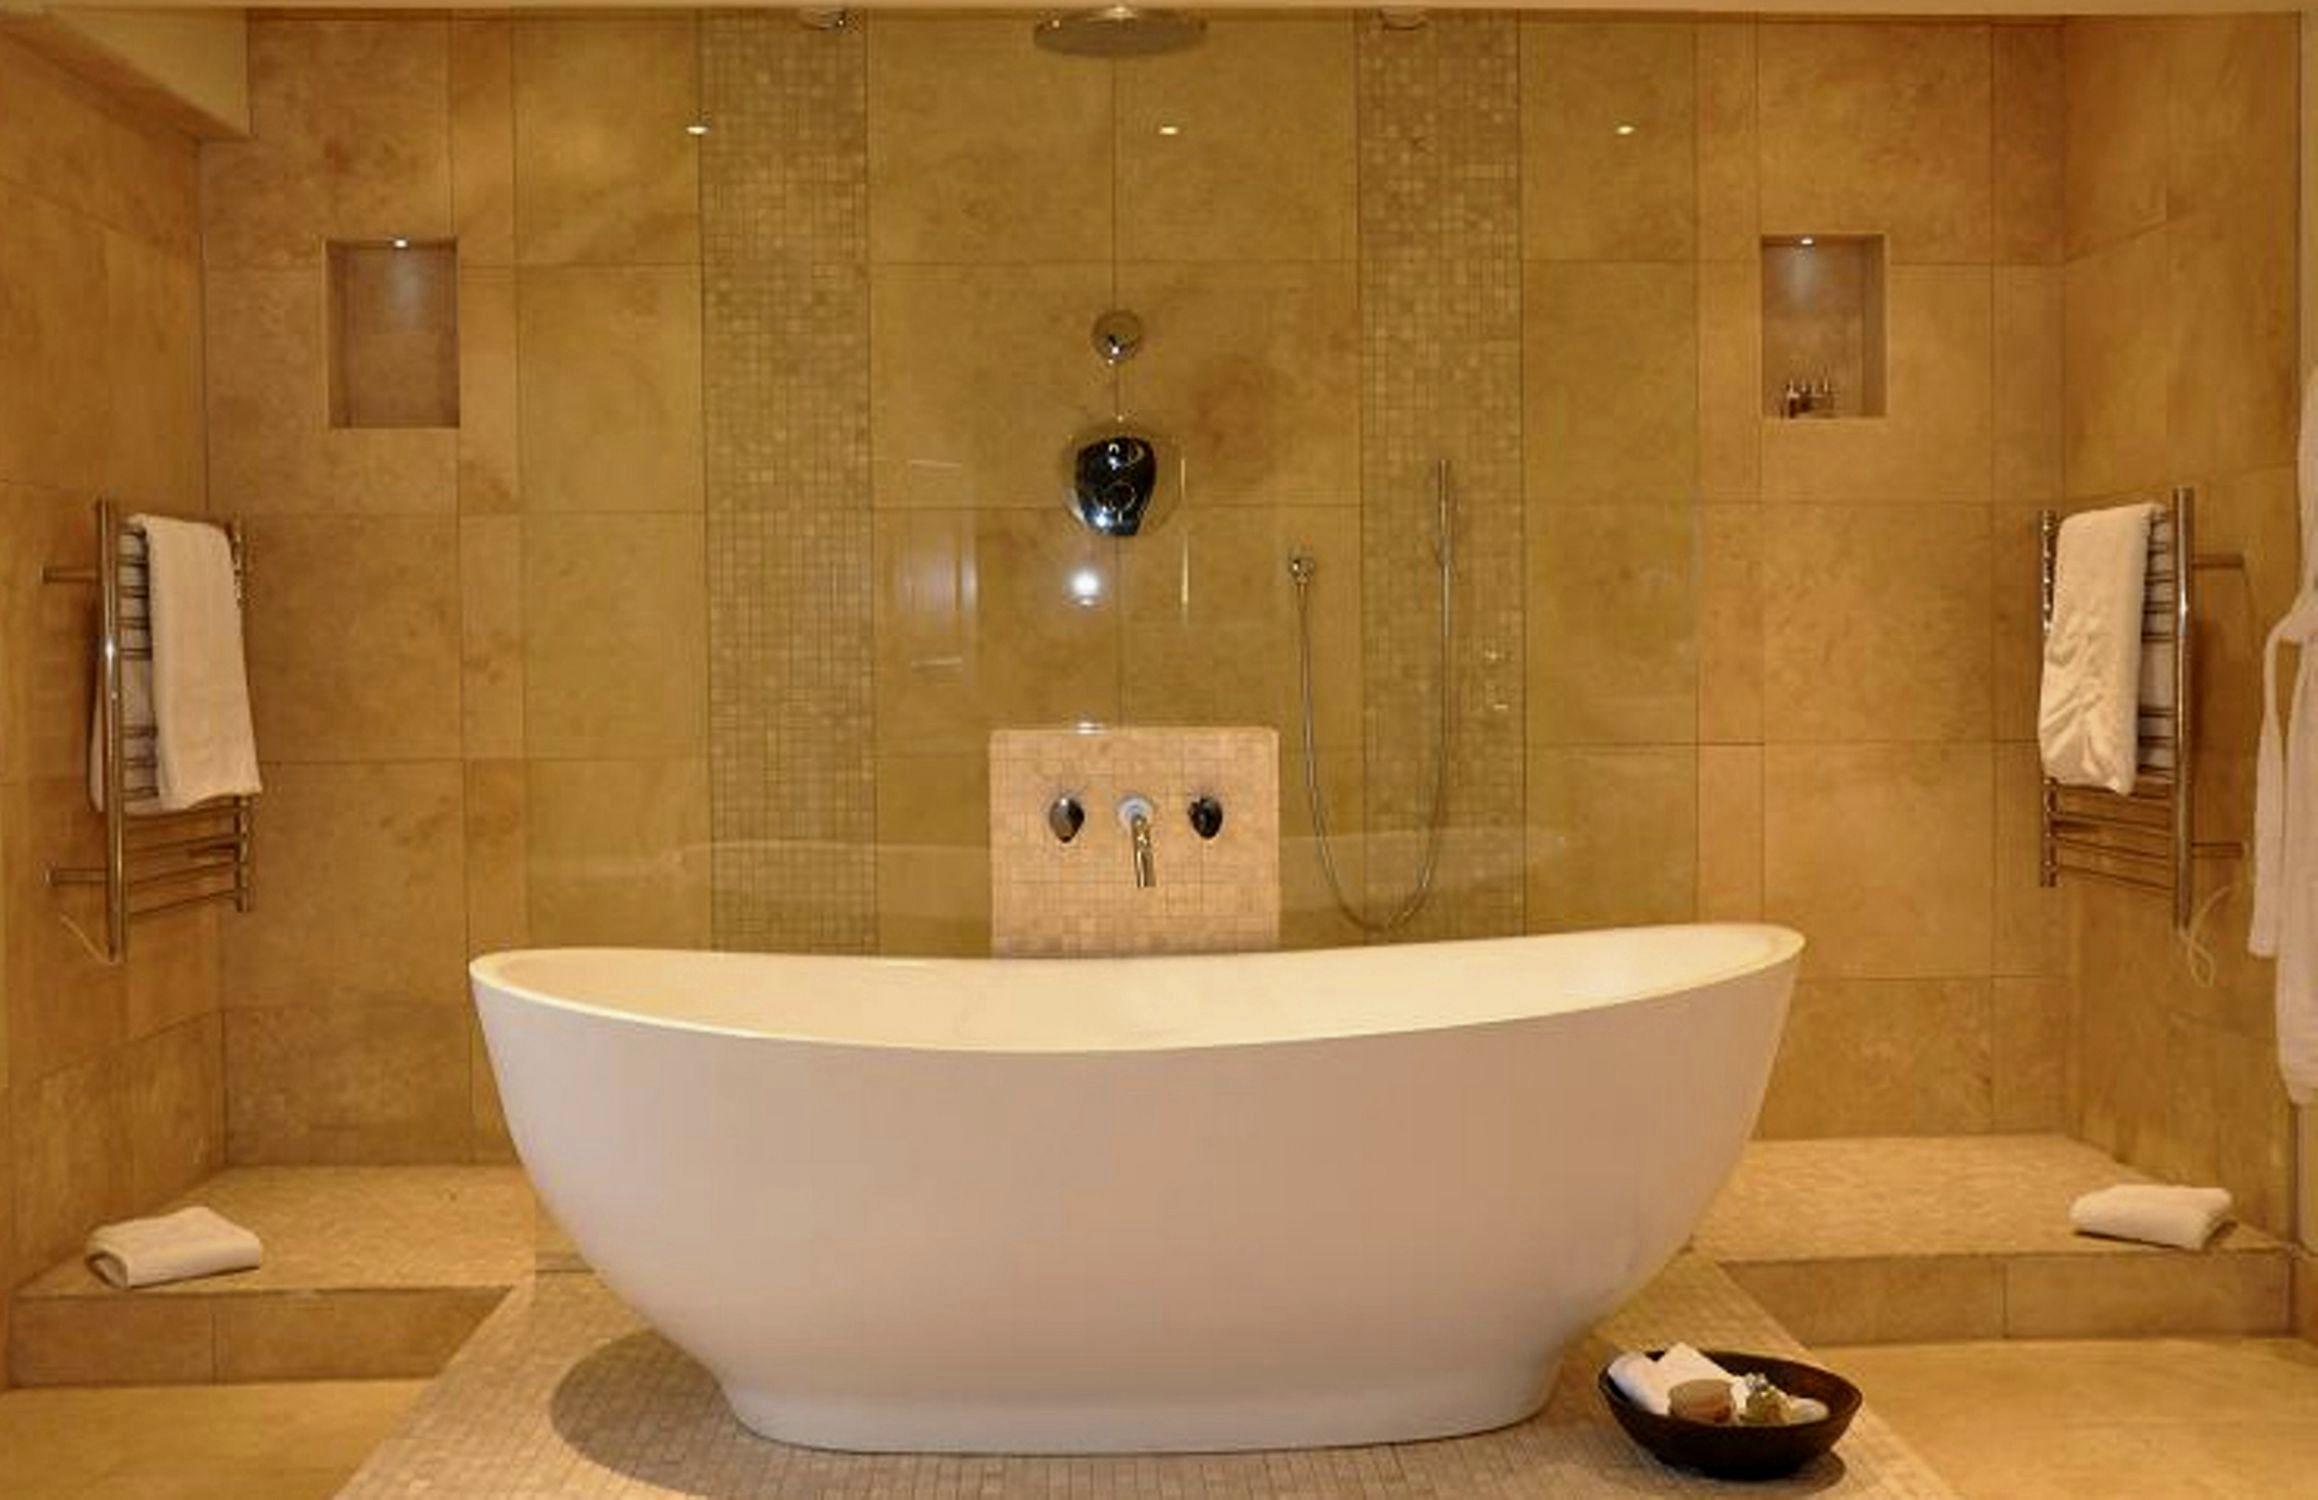 terrific undermount bathroom sinks layout-New Undermount Bathroom Sinks Construction